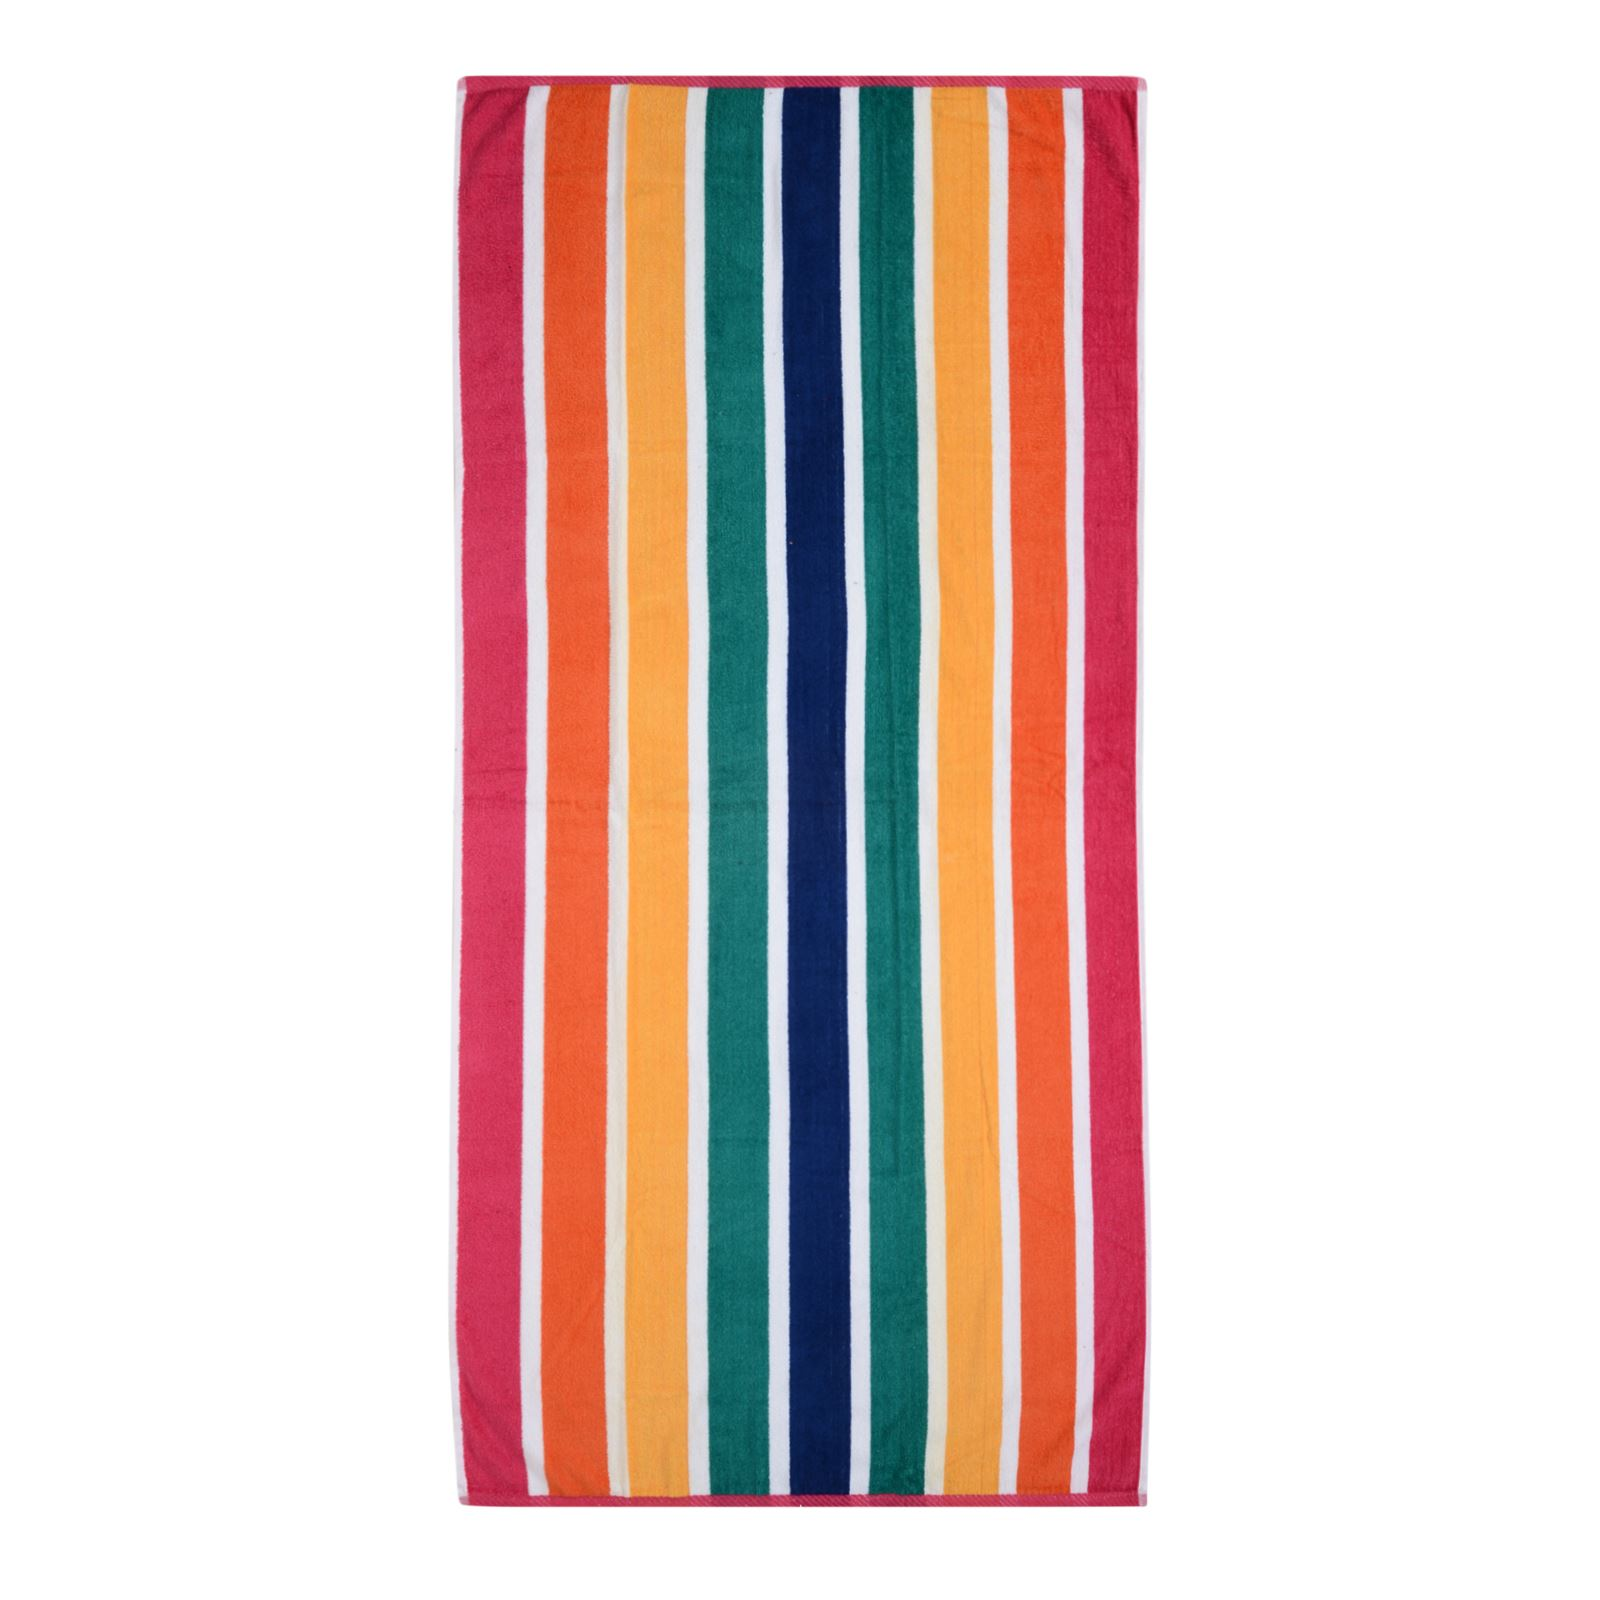 Gym Towel Online India: Large Velour Beach Bath Towels Cotton Striped Towels